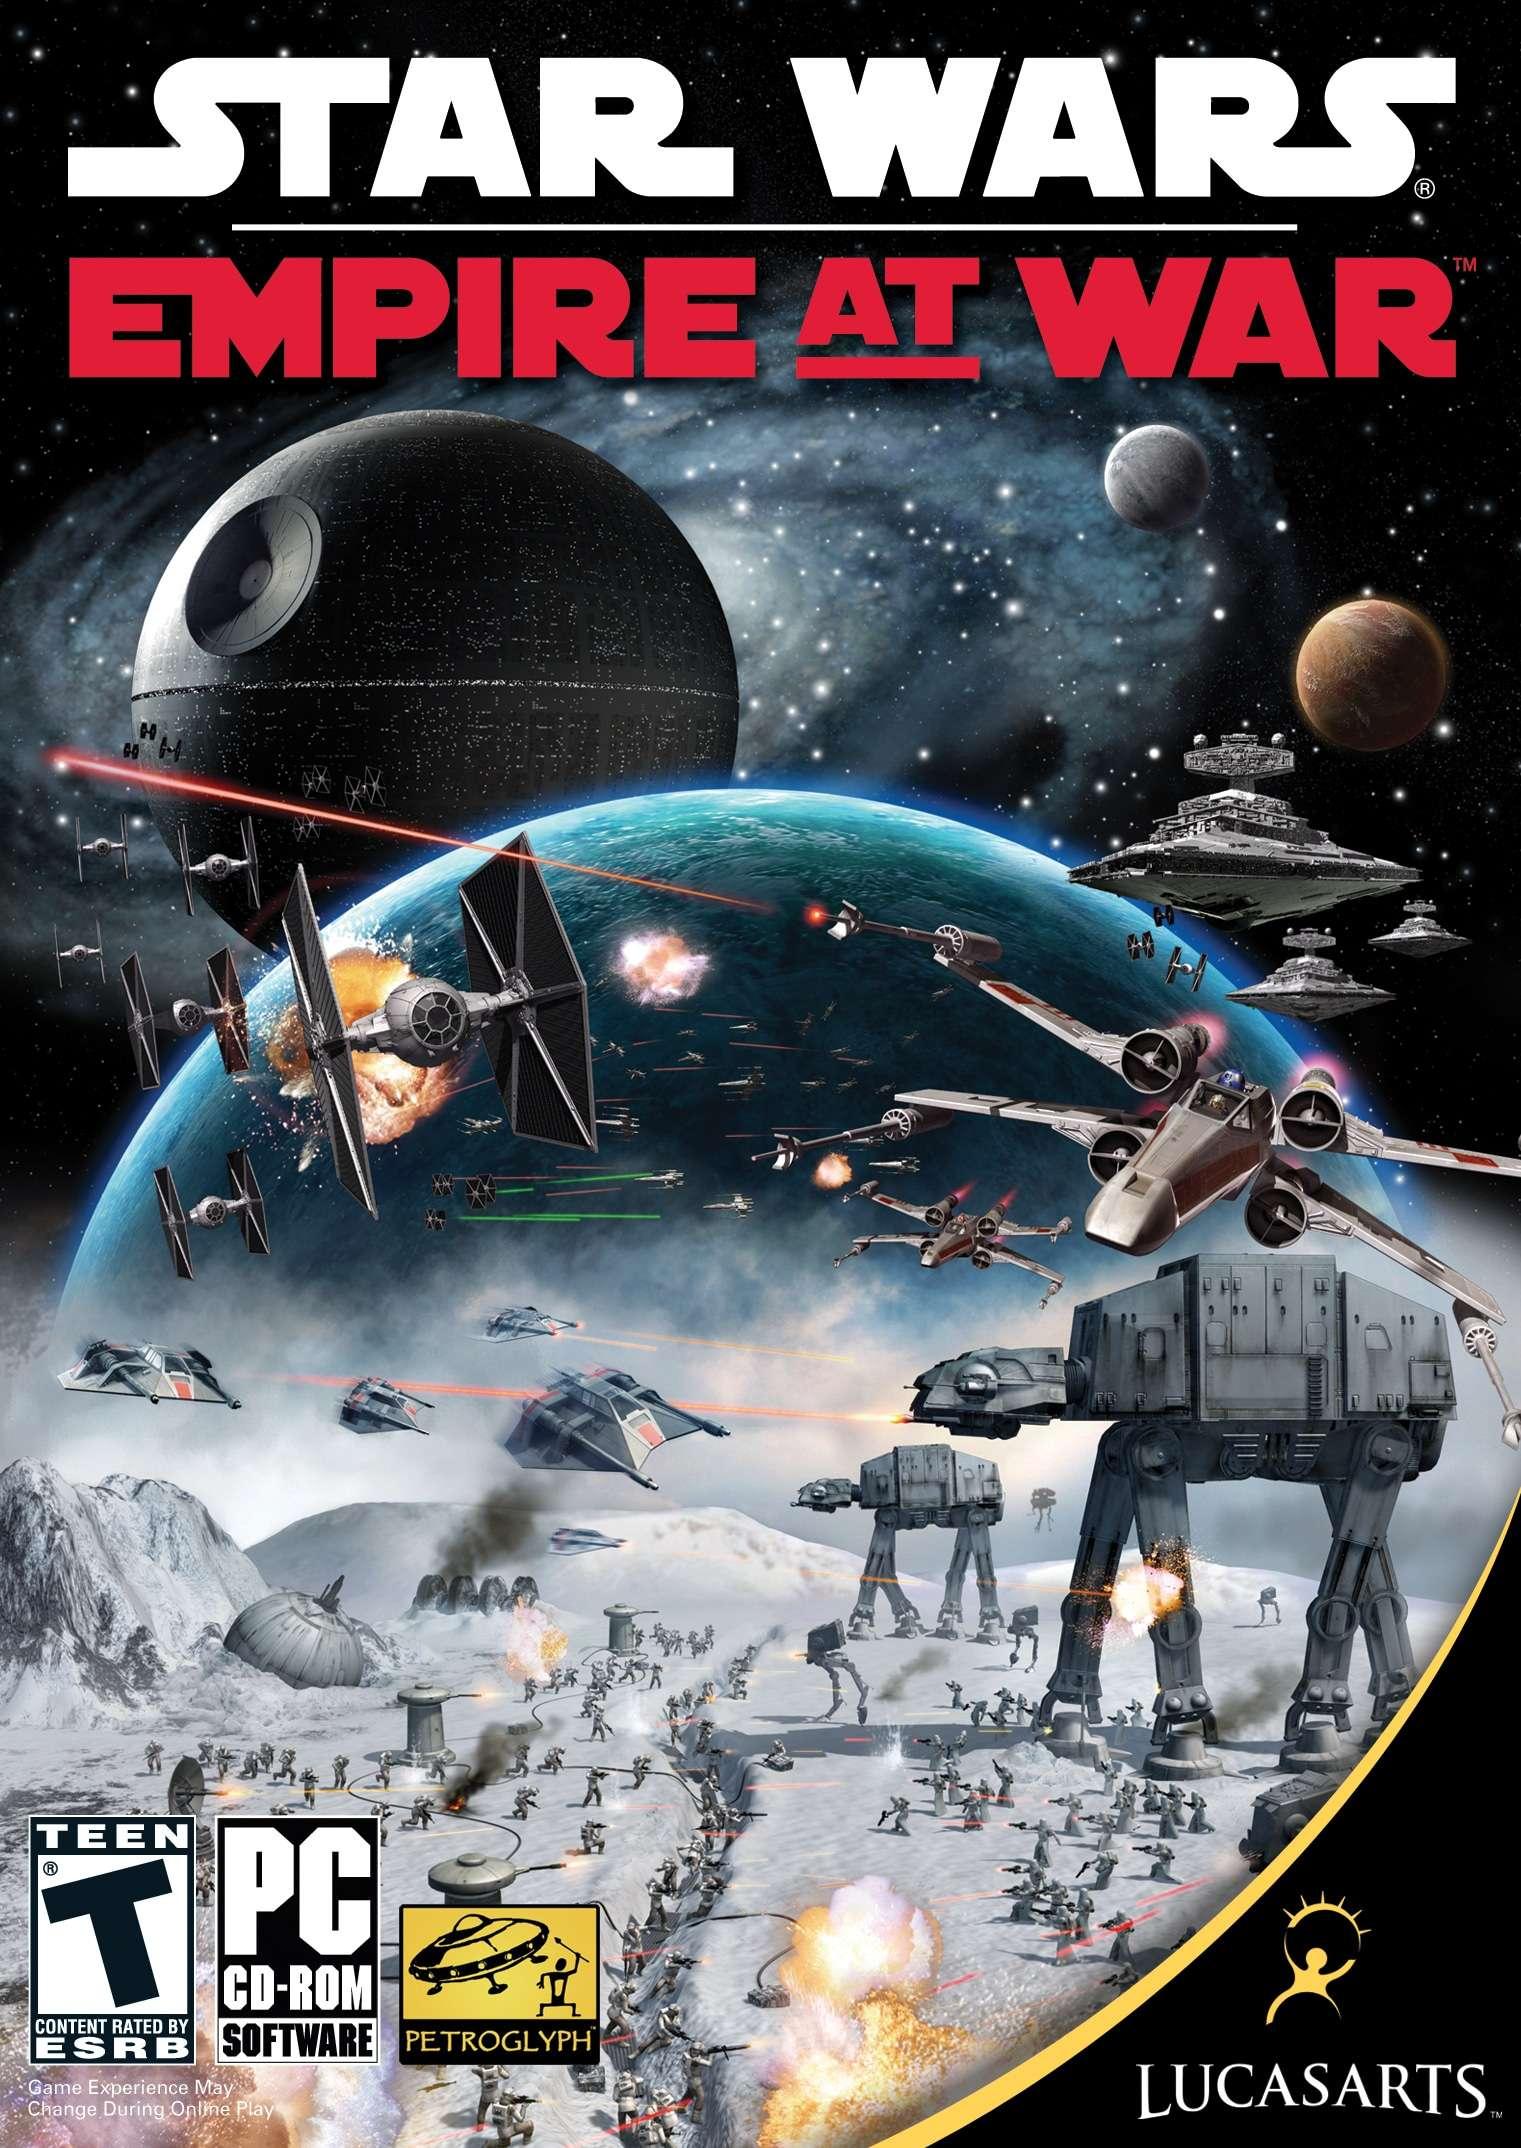 , Star Wars: Empire at War: una nuova patch dopo 15 anni dall'uscita, Star Wars Addicted